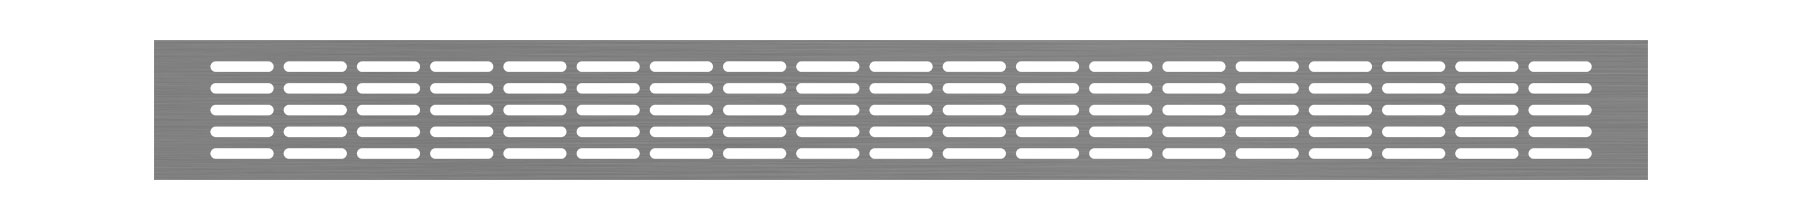 VRS-006 - Ventilaciona rešetka 66×710 mm